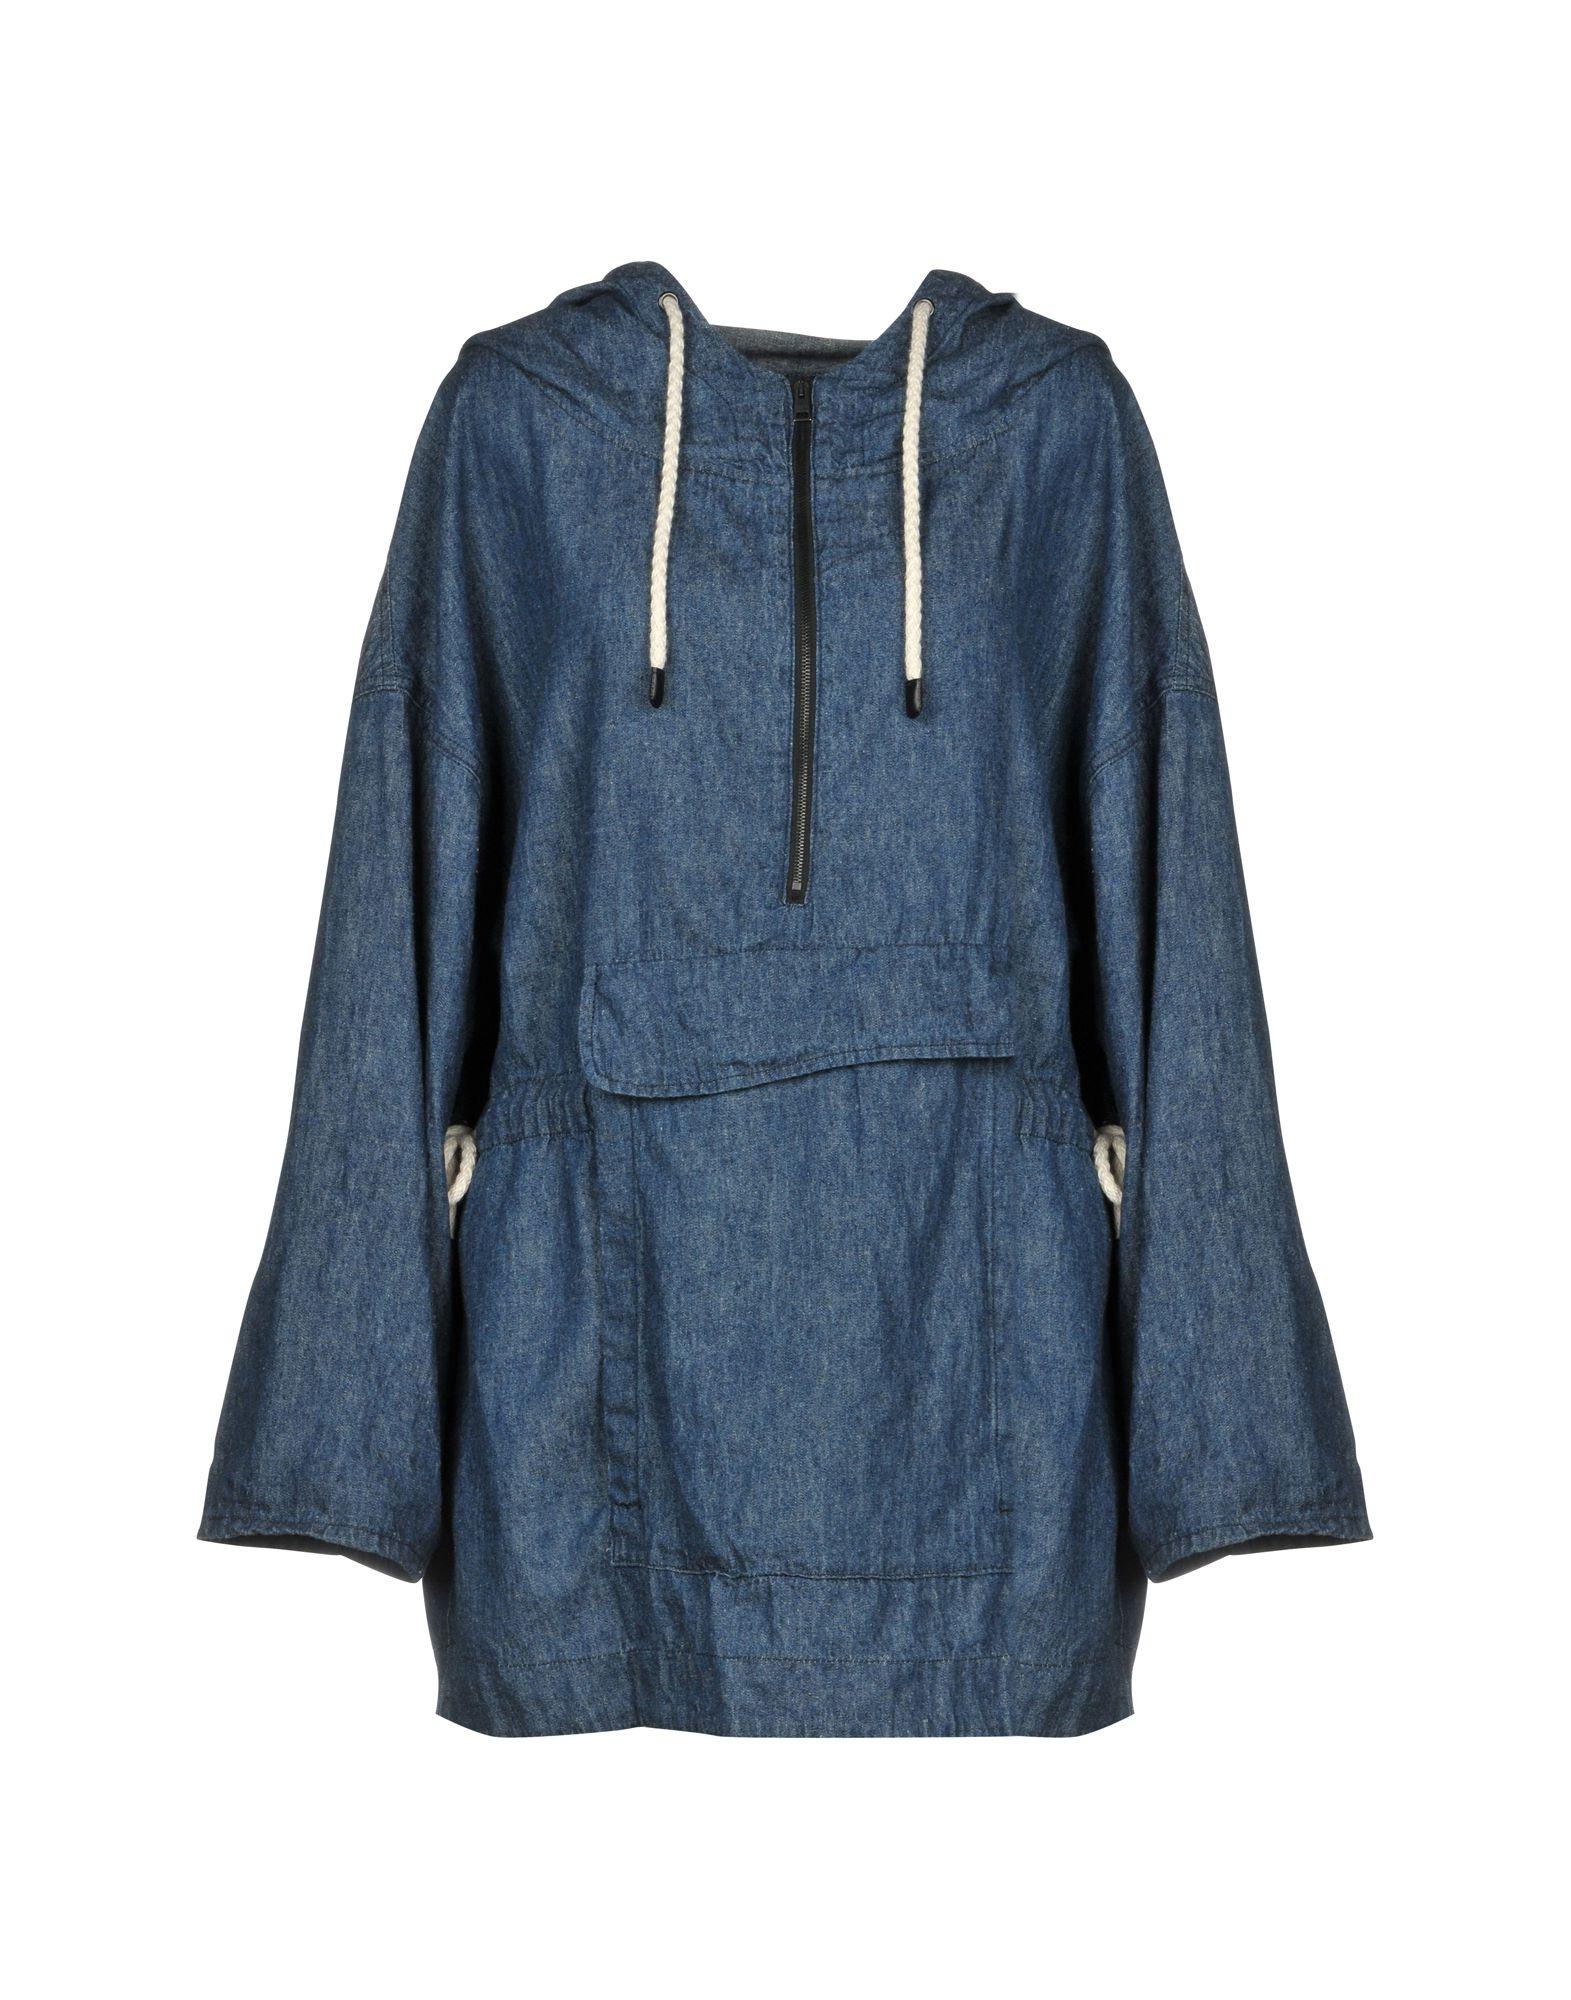 TELA Джинсовая верхняя одежда детская верхняя одежда wellber